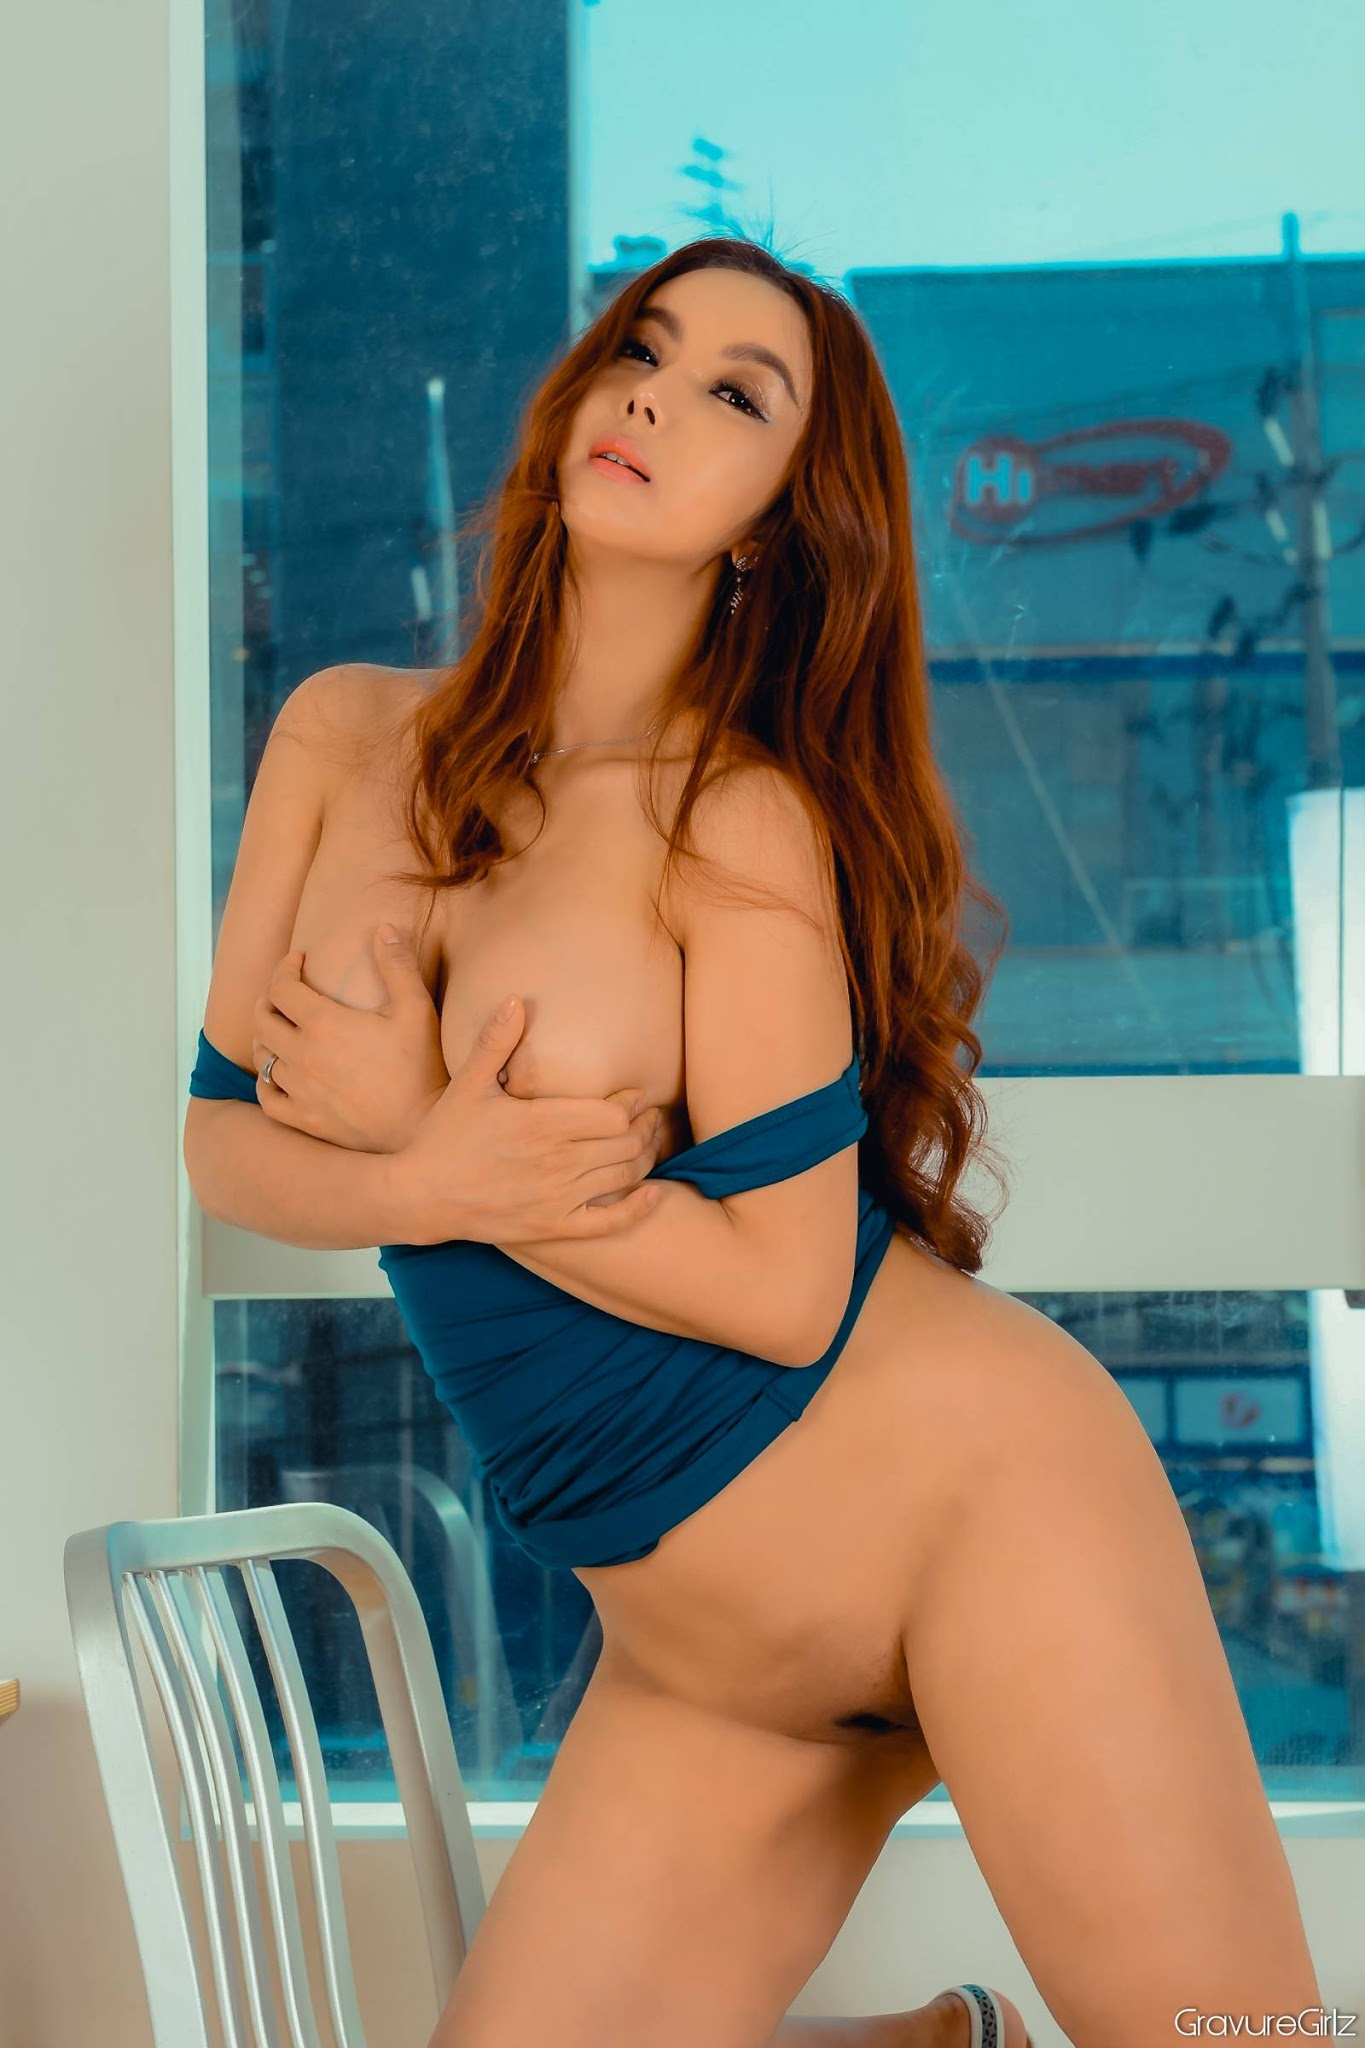 Elizabeth fake koream girl naked hairy